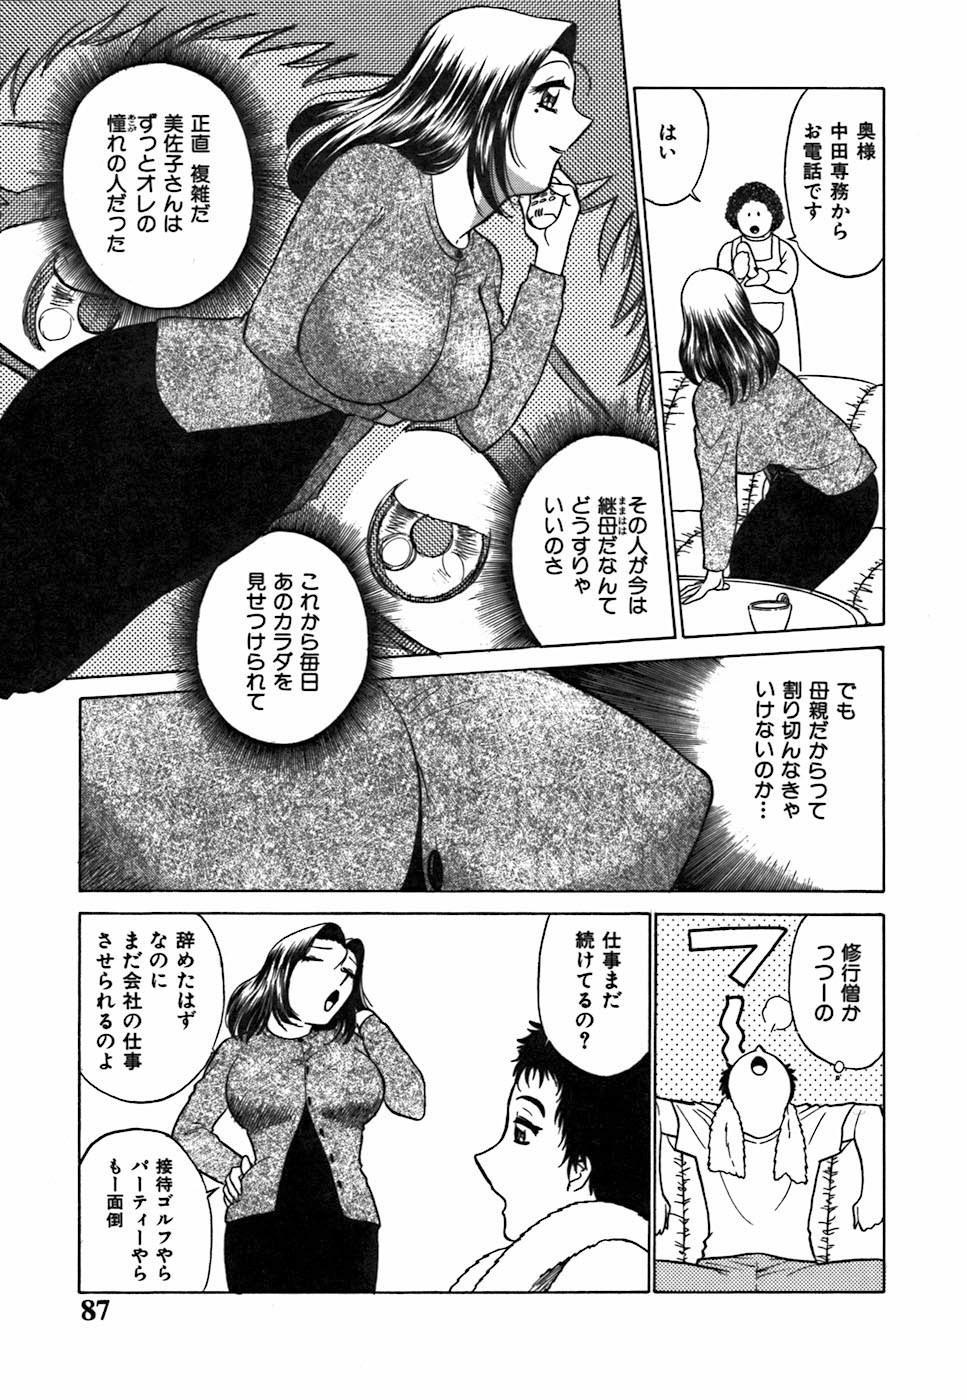 Kimi ga Nozomu Katachi | Appearance for which you hope 86